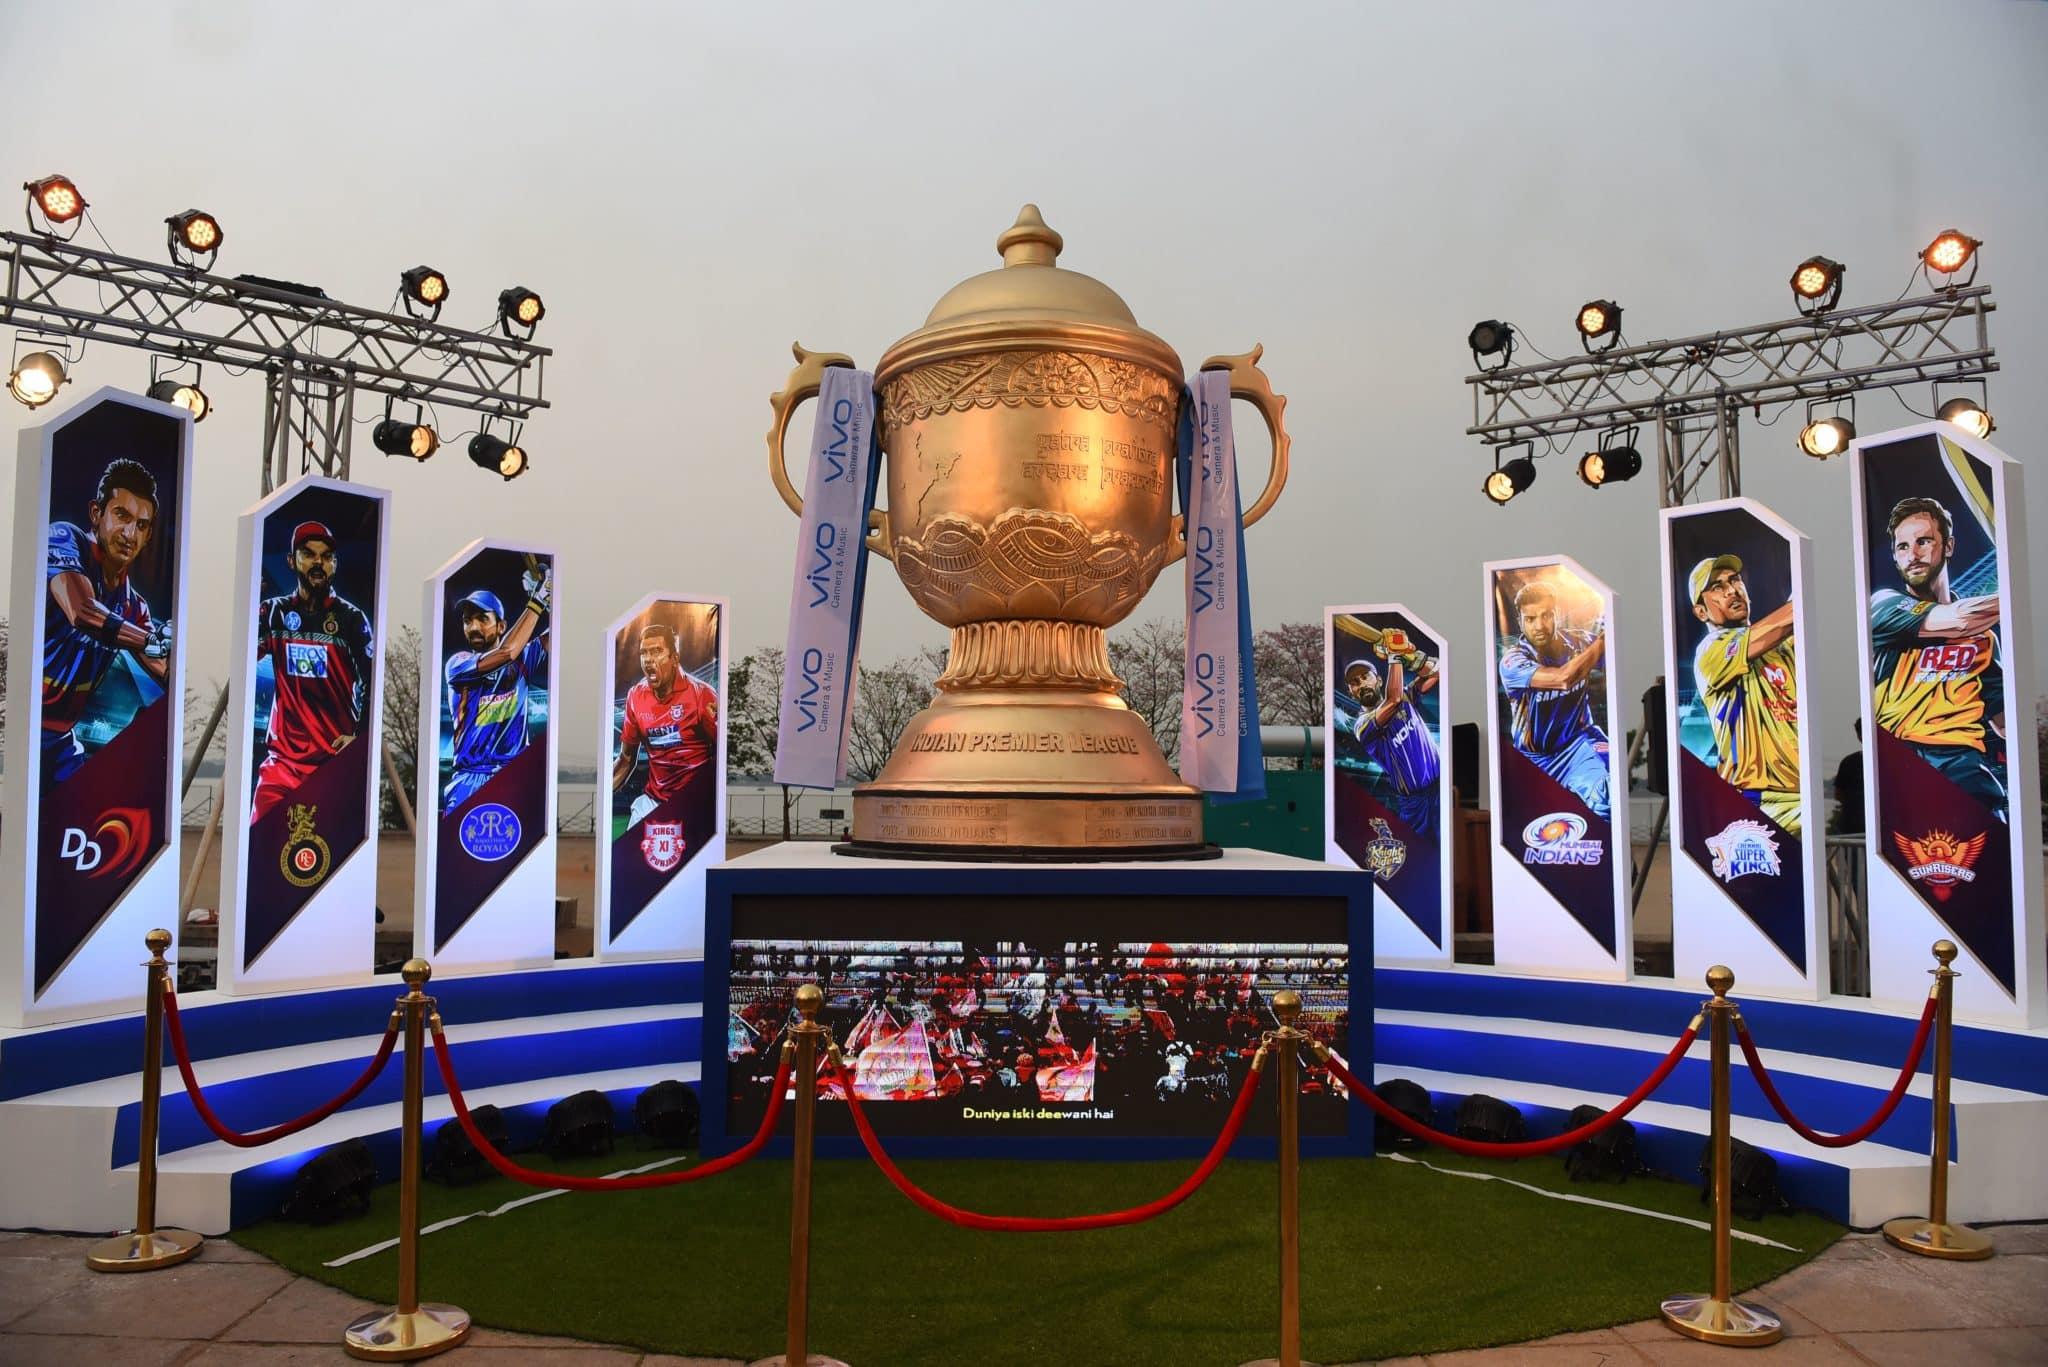 Trophy displayed, ahead of the IPL 2018